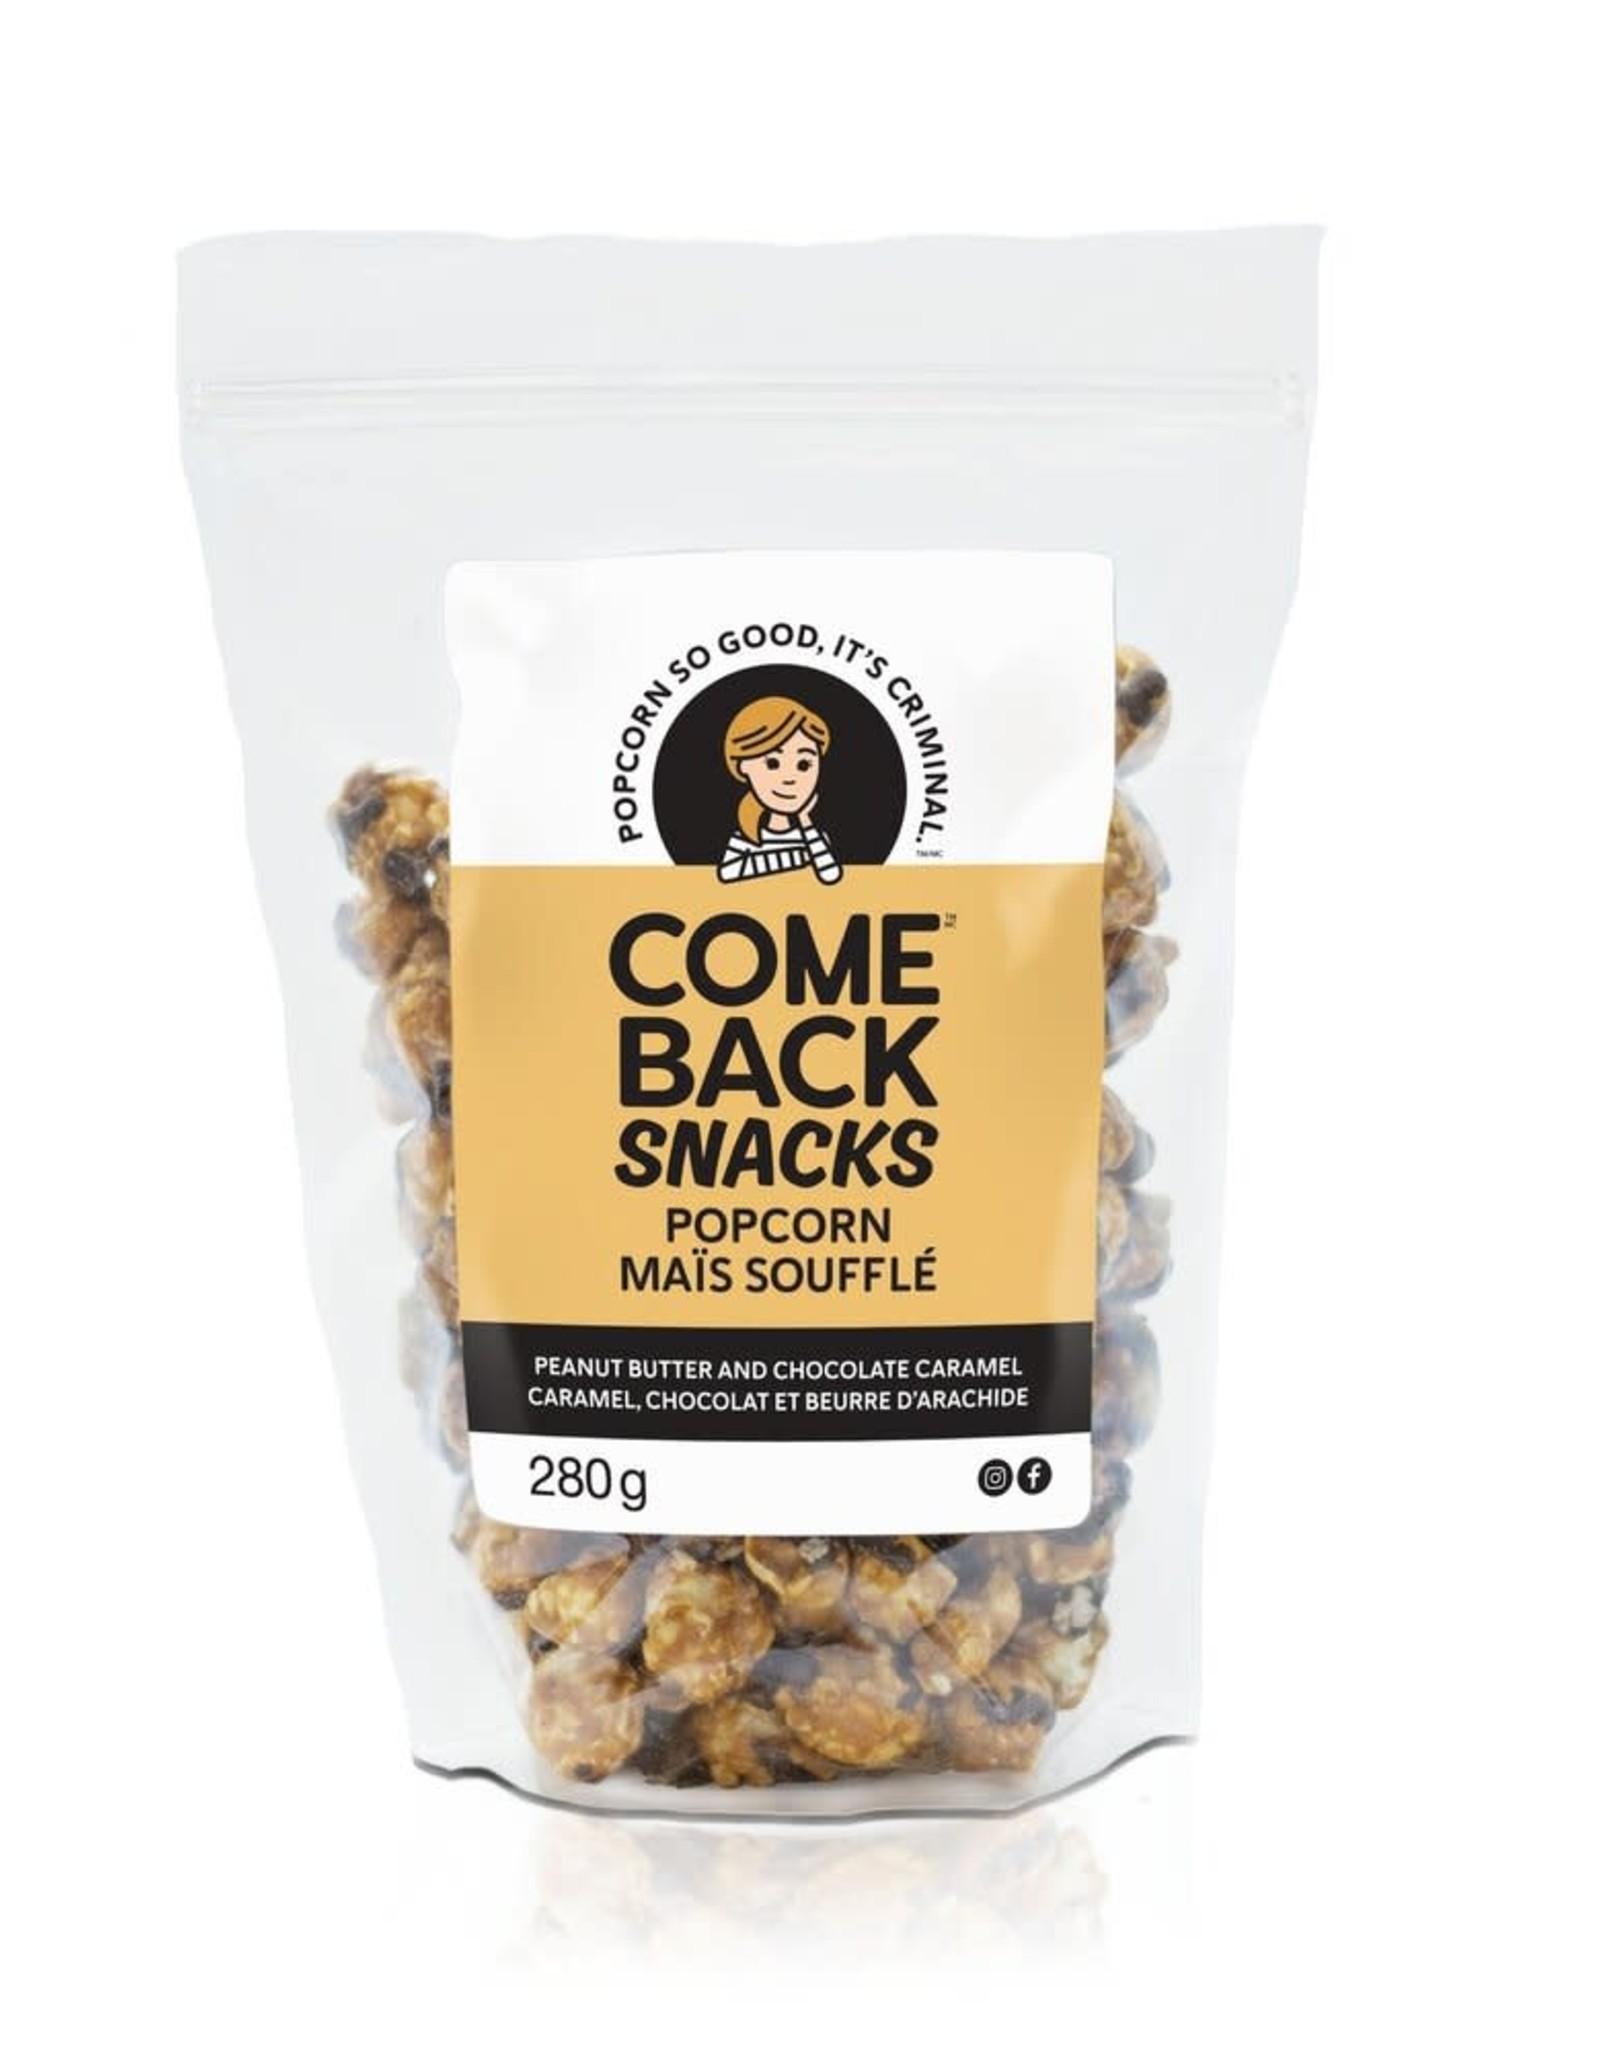 Comeback Snacks Peanut Butter and Chocolate Caramel Popcorn